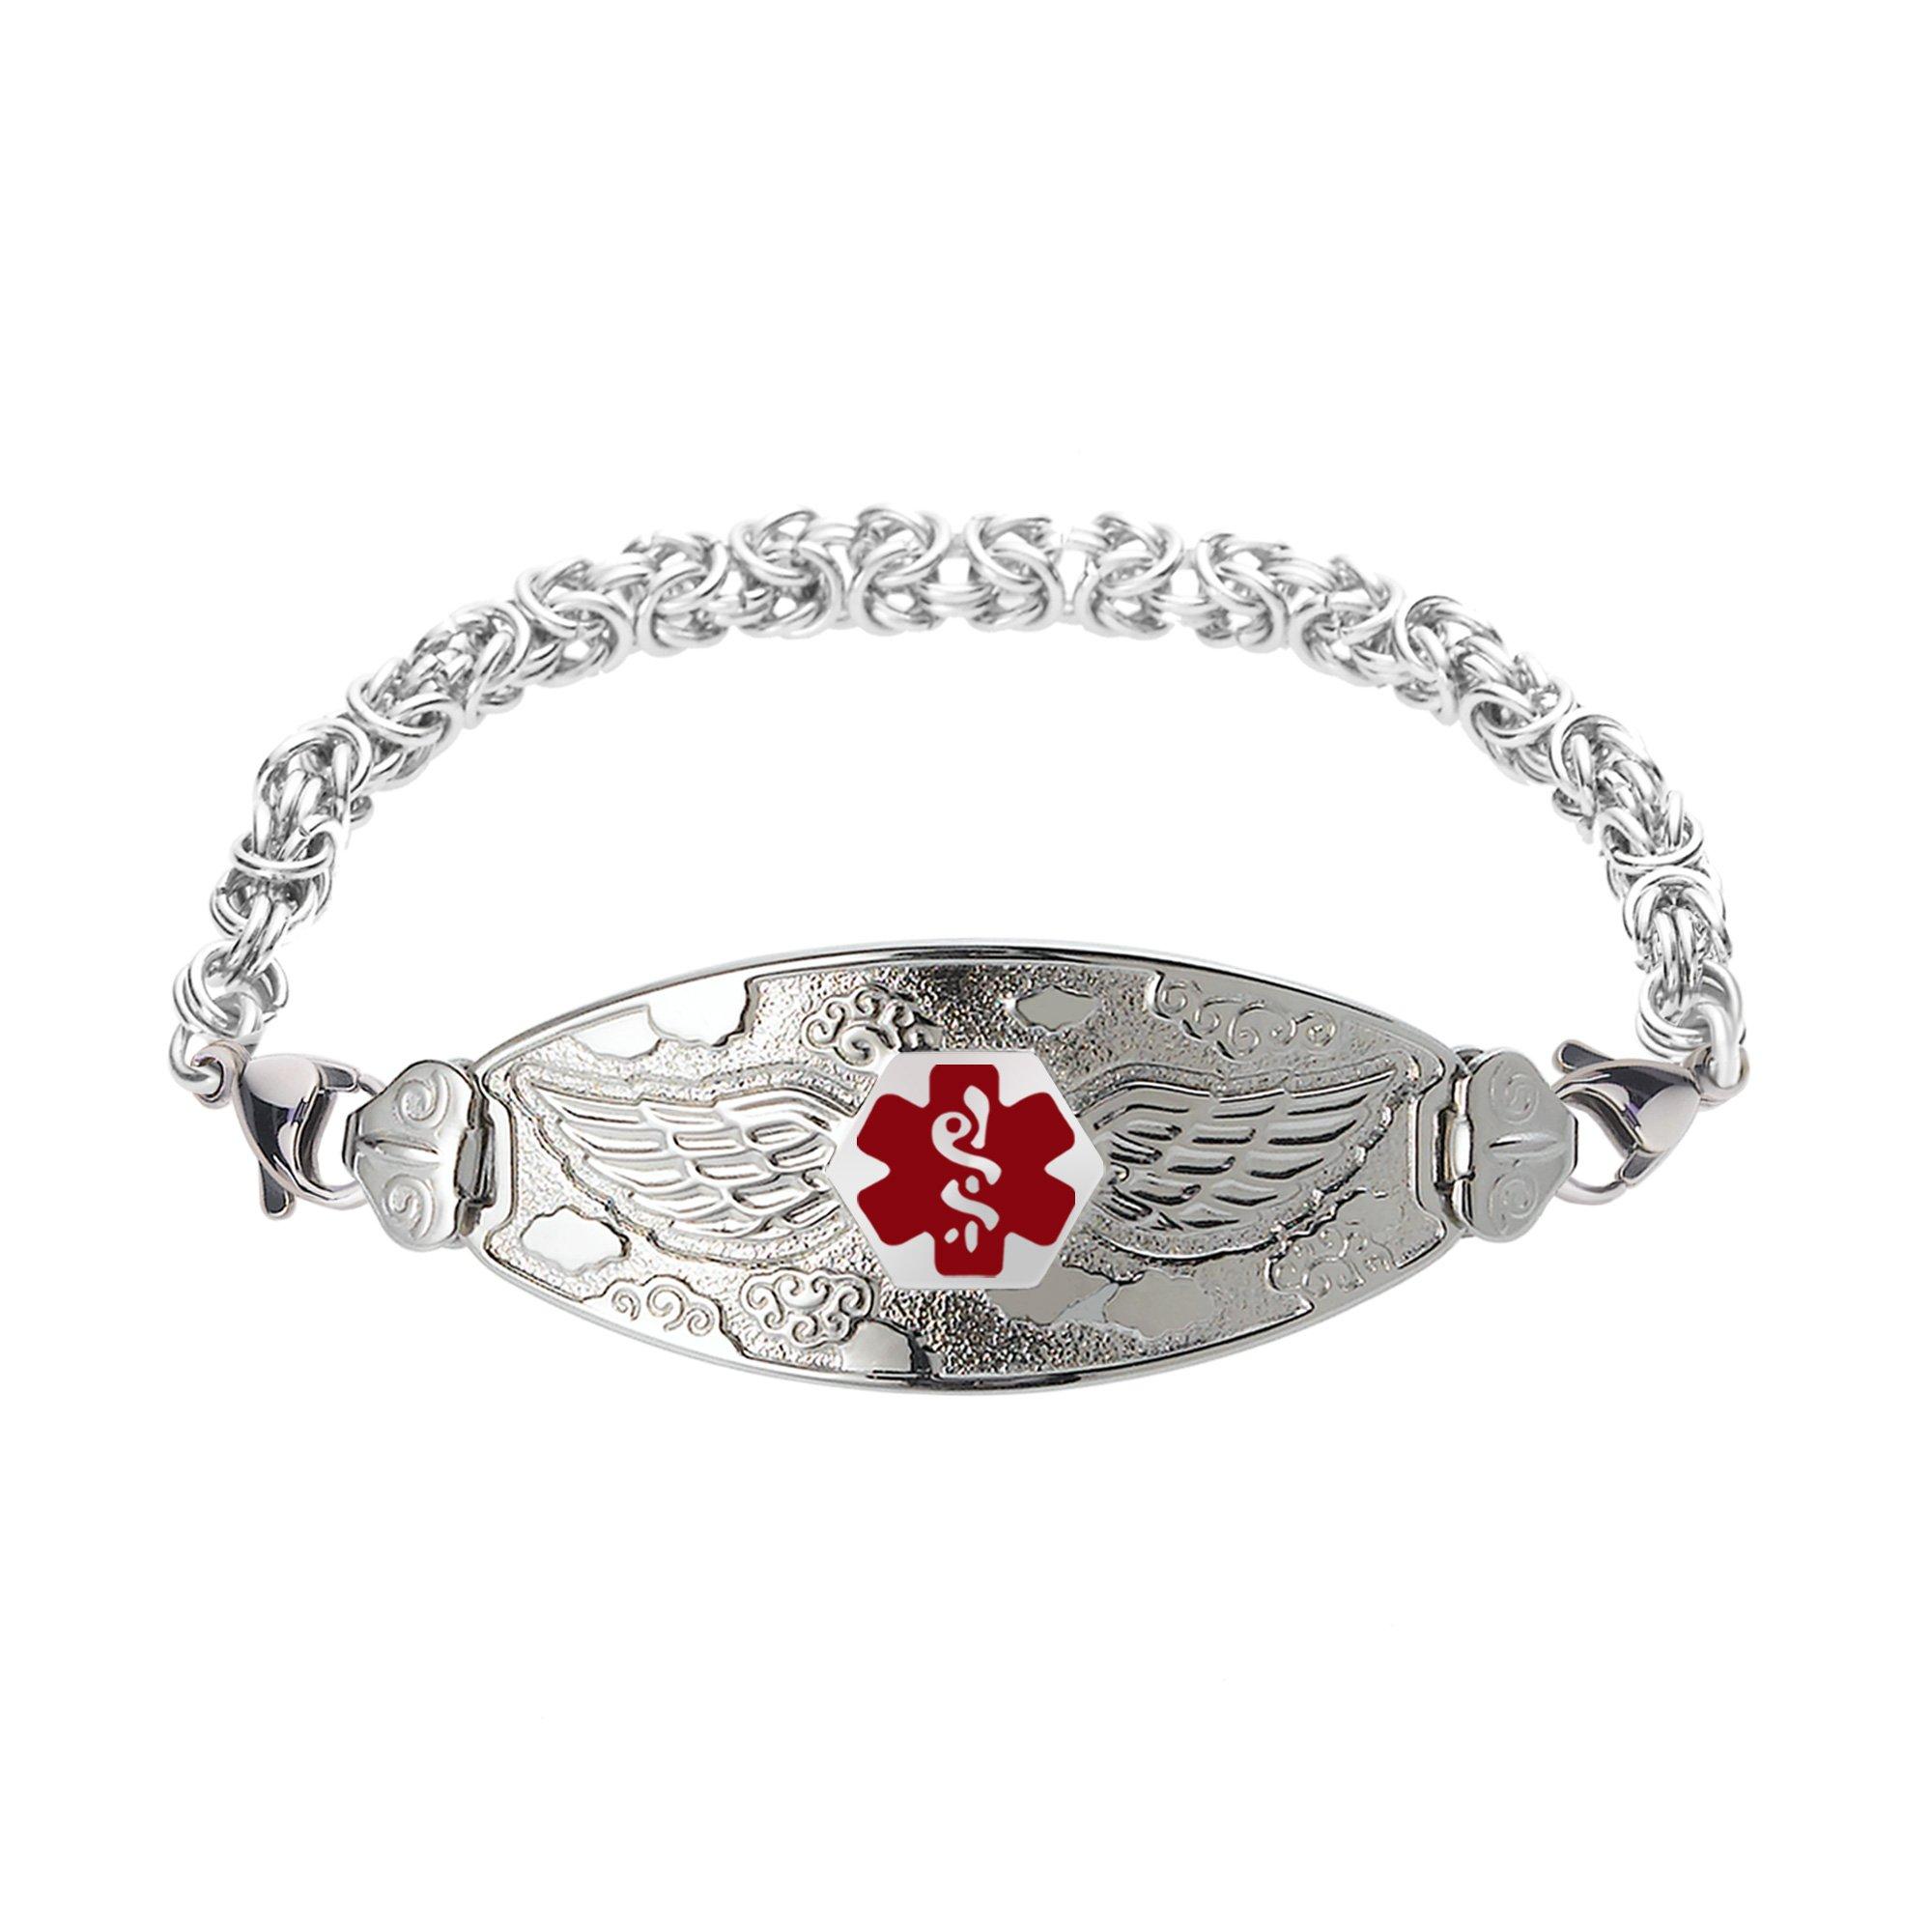 Divoti Custom Engraved Angel Wing Medical Alert Bracelet -Handmade Byzantine -Red-8.0''